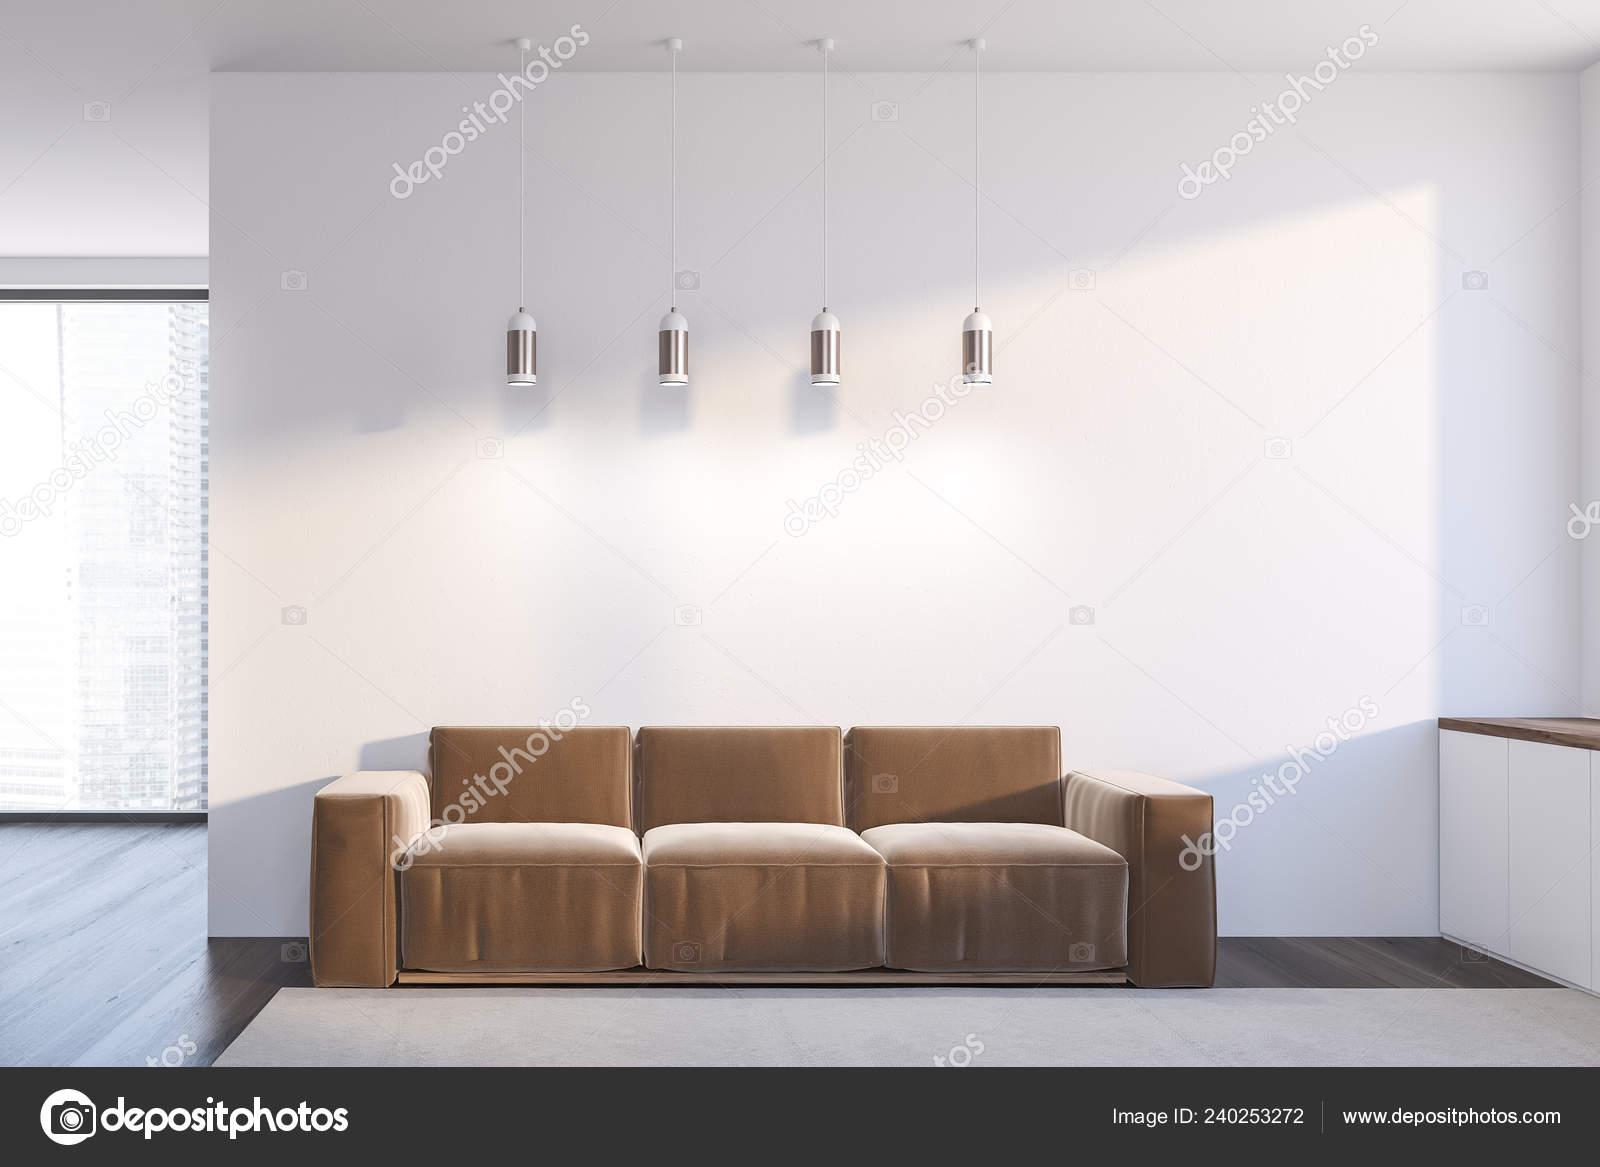 Interior Minimalistic Living Room White Walls Dark Wooden Floor